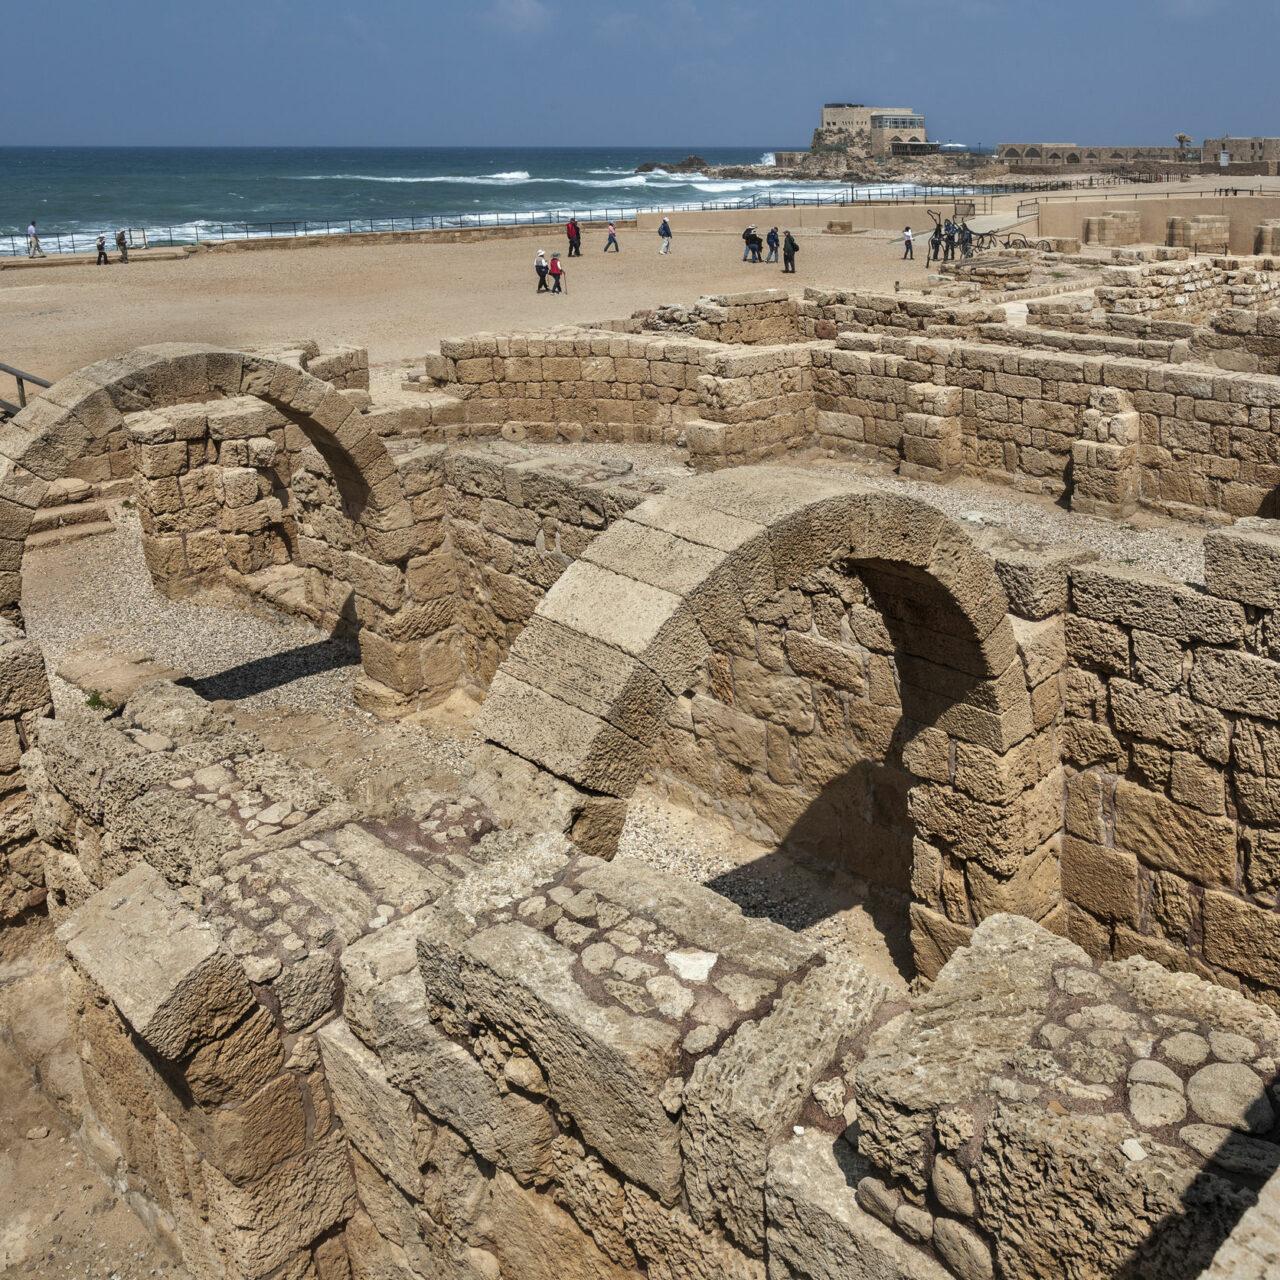 https://secureservercdn.net/198.71.233.72/z4b.963.myftpupload.com/wp-content/uploads/2020/01/Caesarea-Maritima-1280x1280.jpg